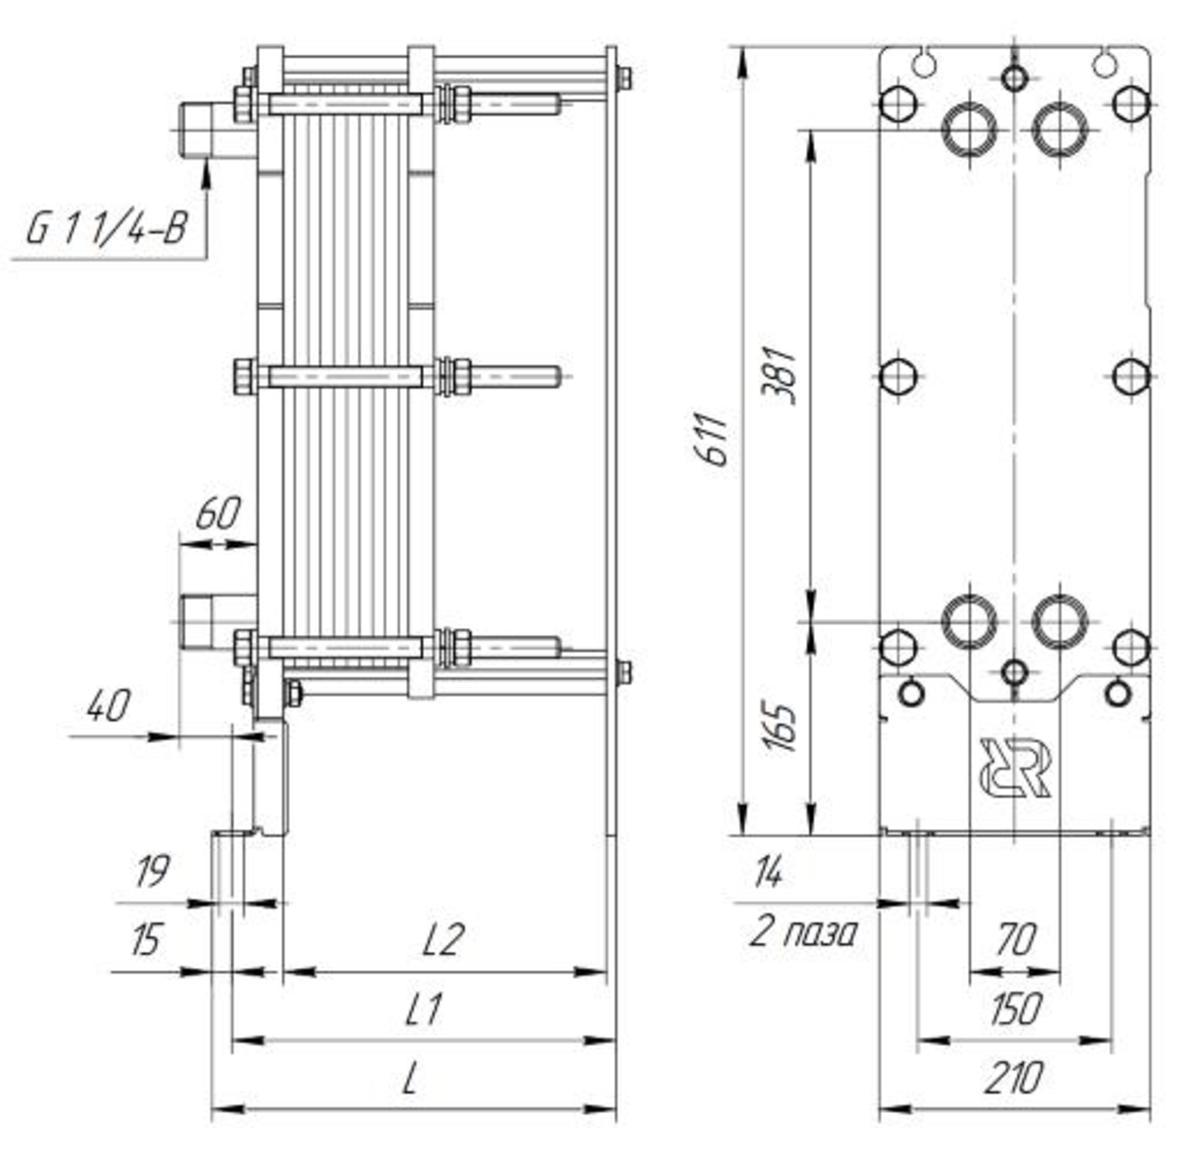 Ридан нн 22 0 16 кг Пластинчатый теплообменник КС 19 Северск